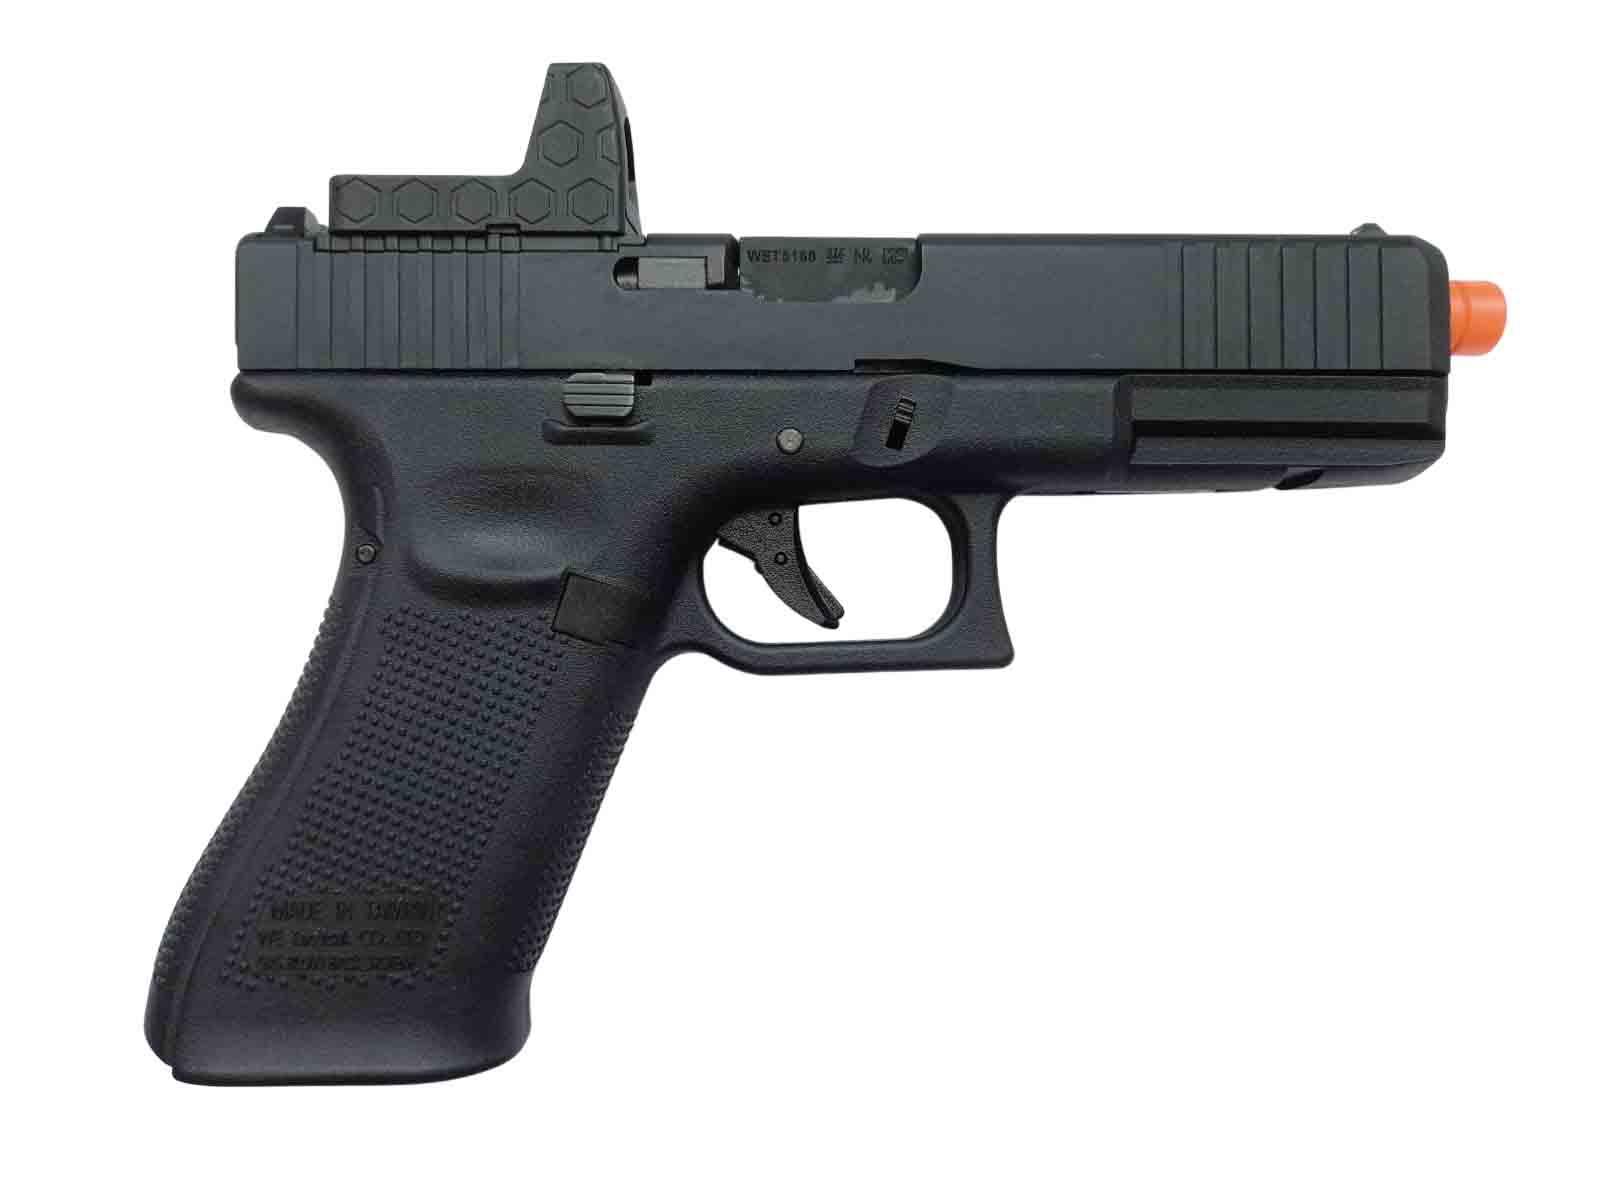 Pistola Airsoft WE Glock G17 Gen 5 MOS GBB Metal e Polímero Black - Calibre 6 mm